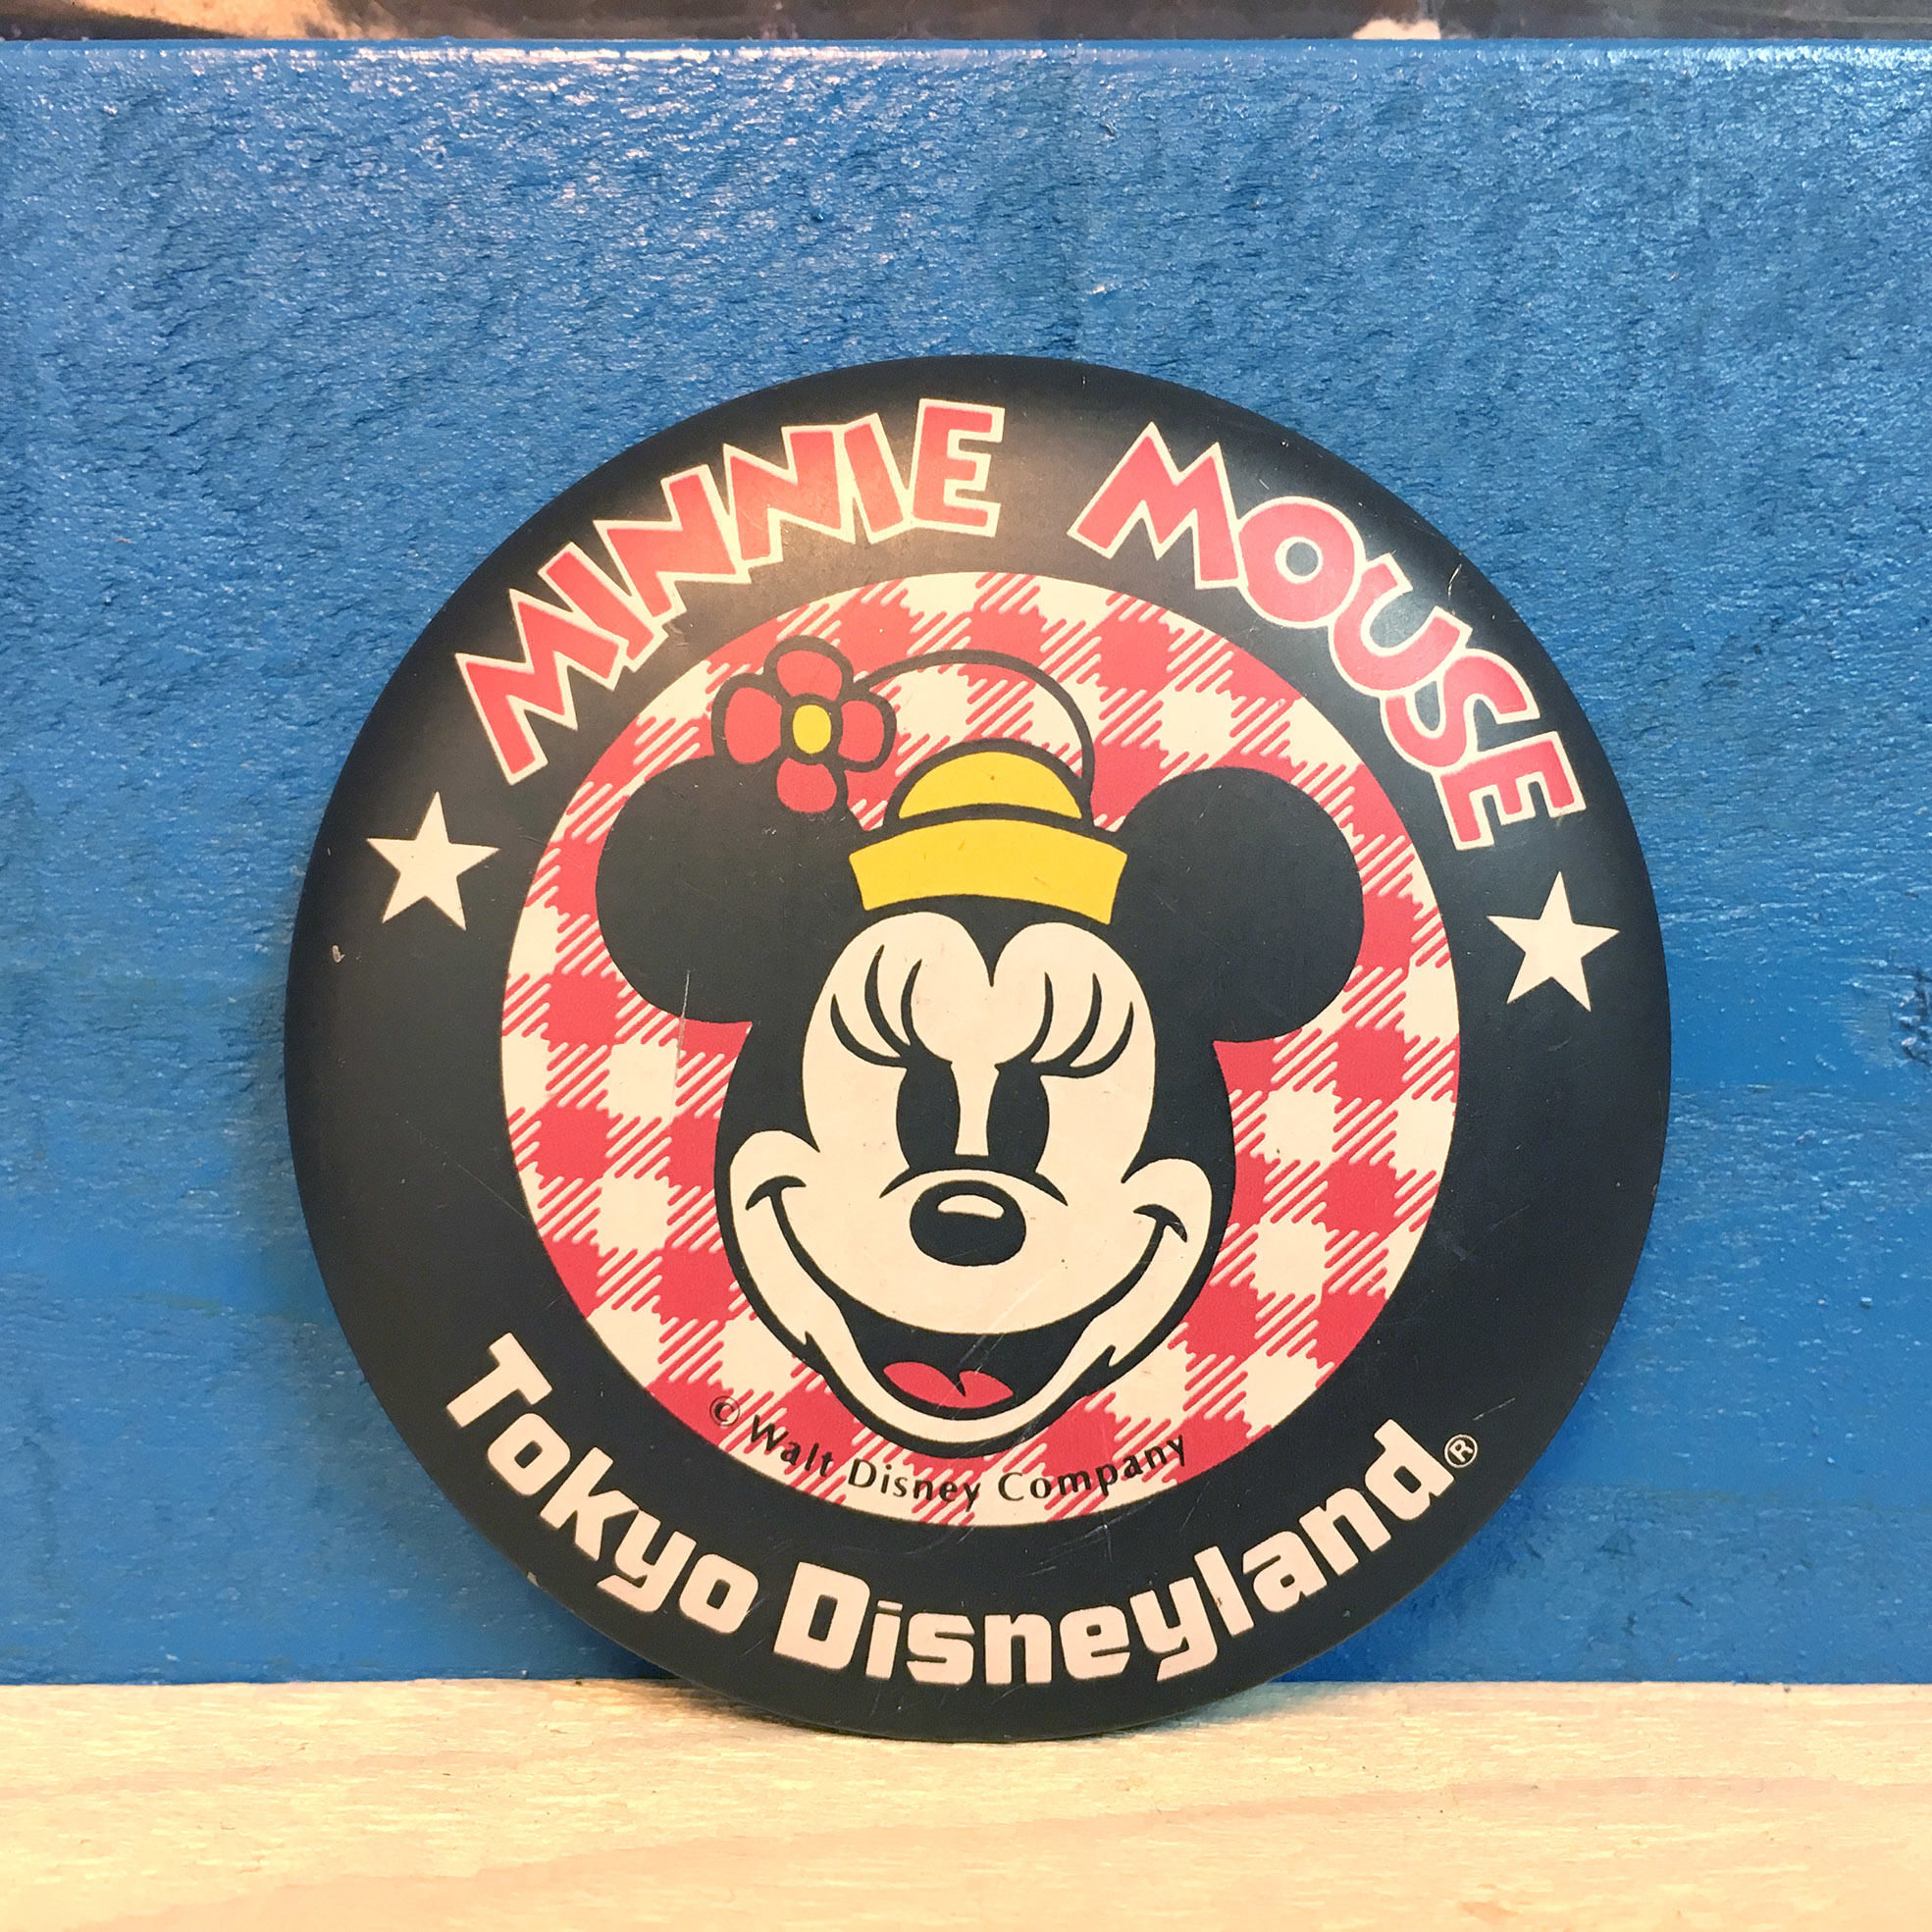 Disney TDL Minnie Mouse Button/ディズニー 東京ディズニーランド ミニー・マウス 缶バッジ/171013-9